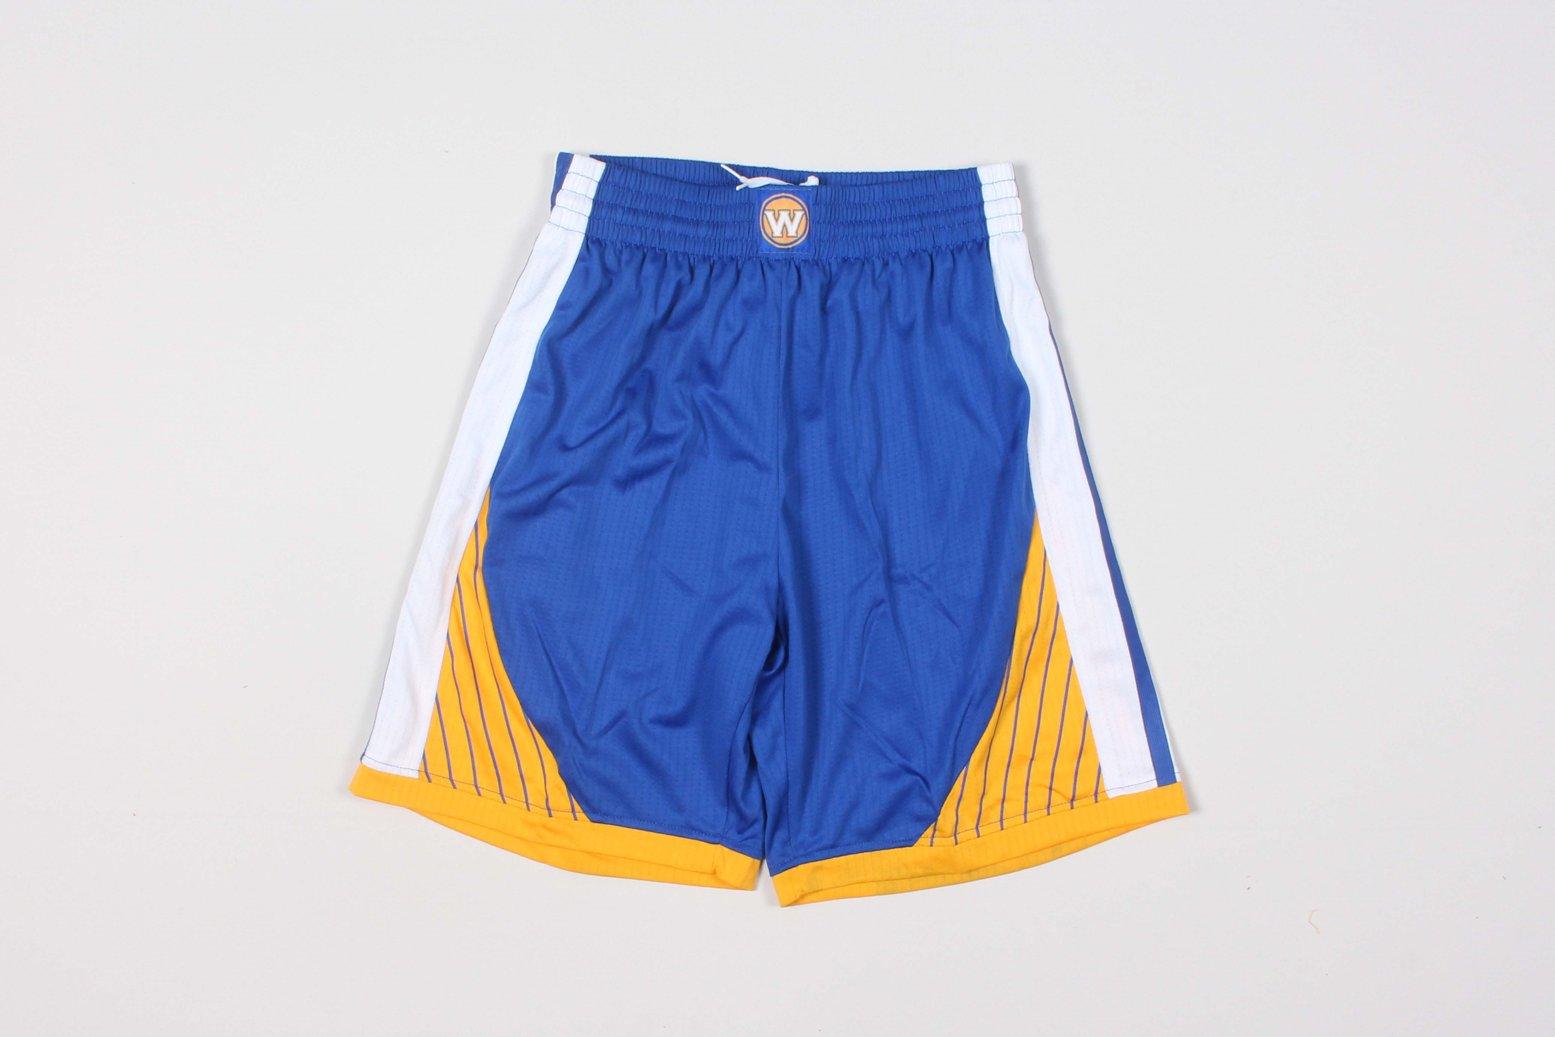 Баскетбольные шорты Golden State Warriors